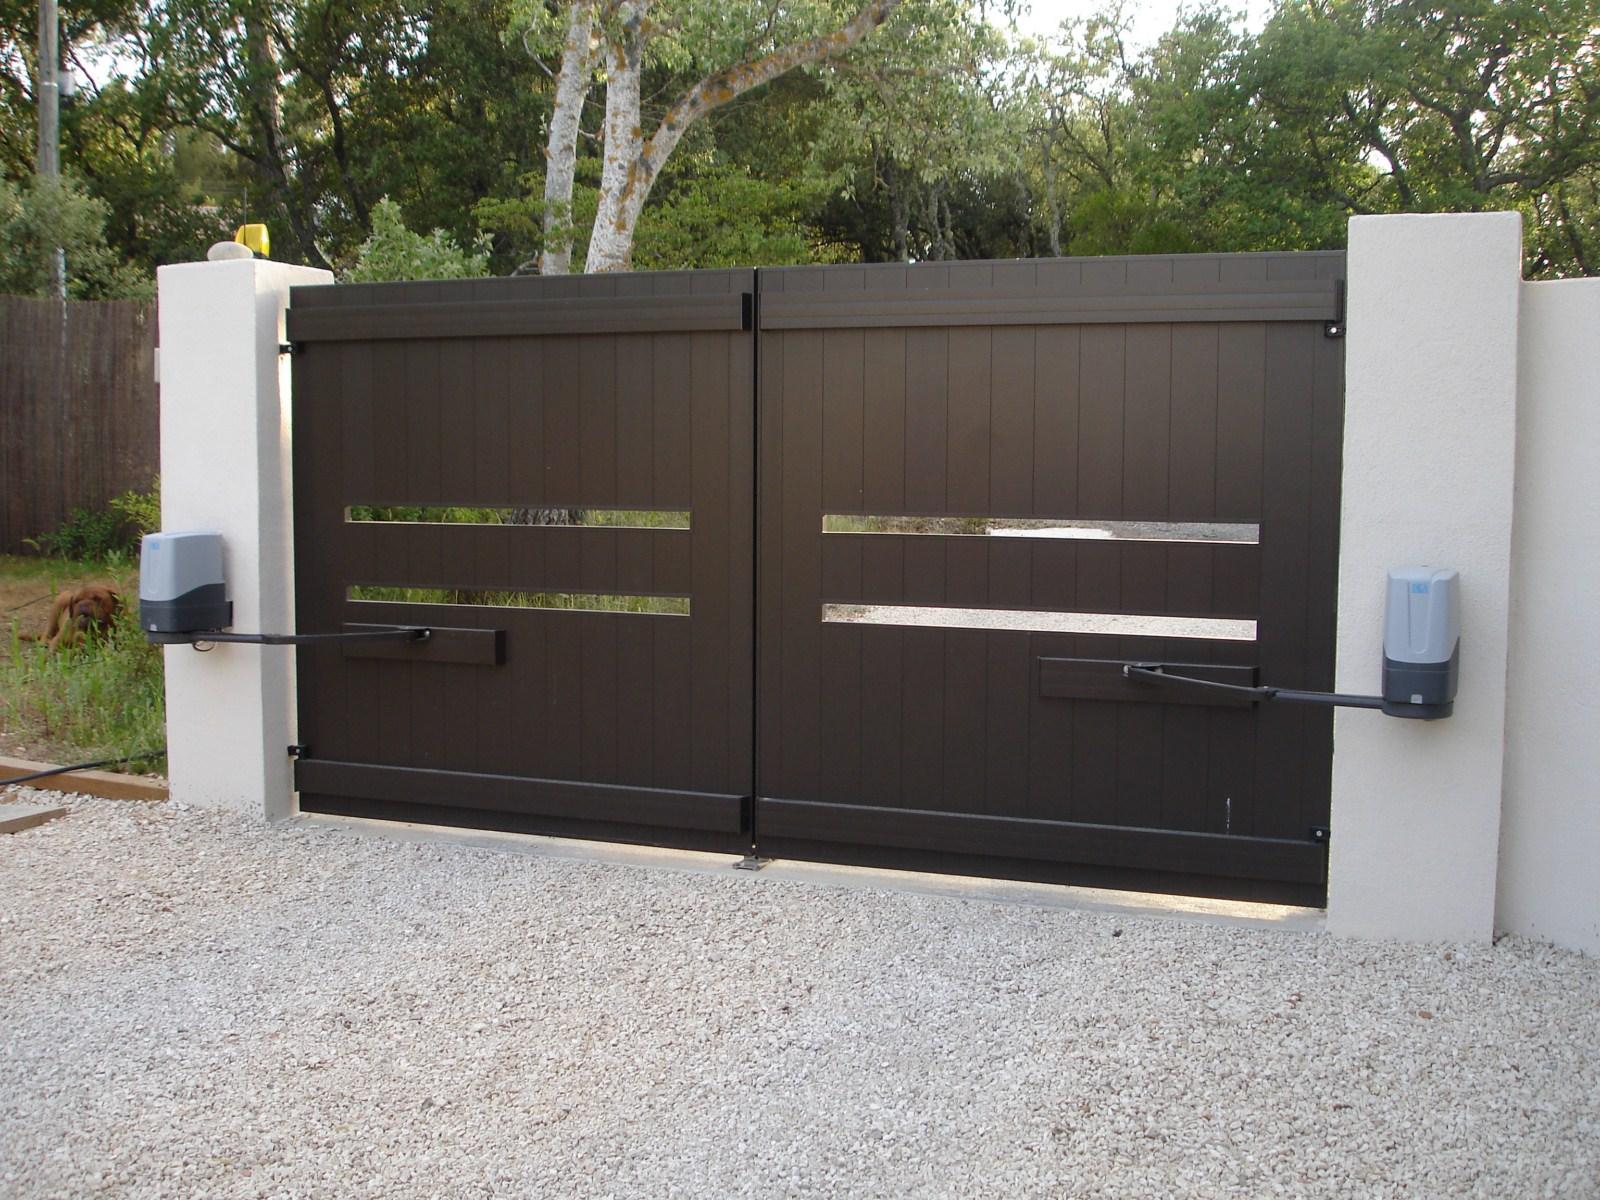 motorisation de portail. Black Bedroom Furniture Sets. Home Design Ideas